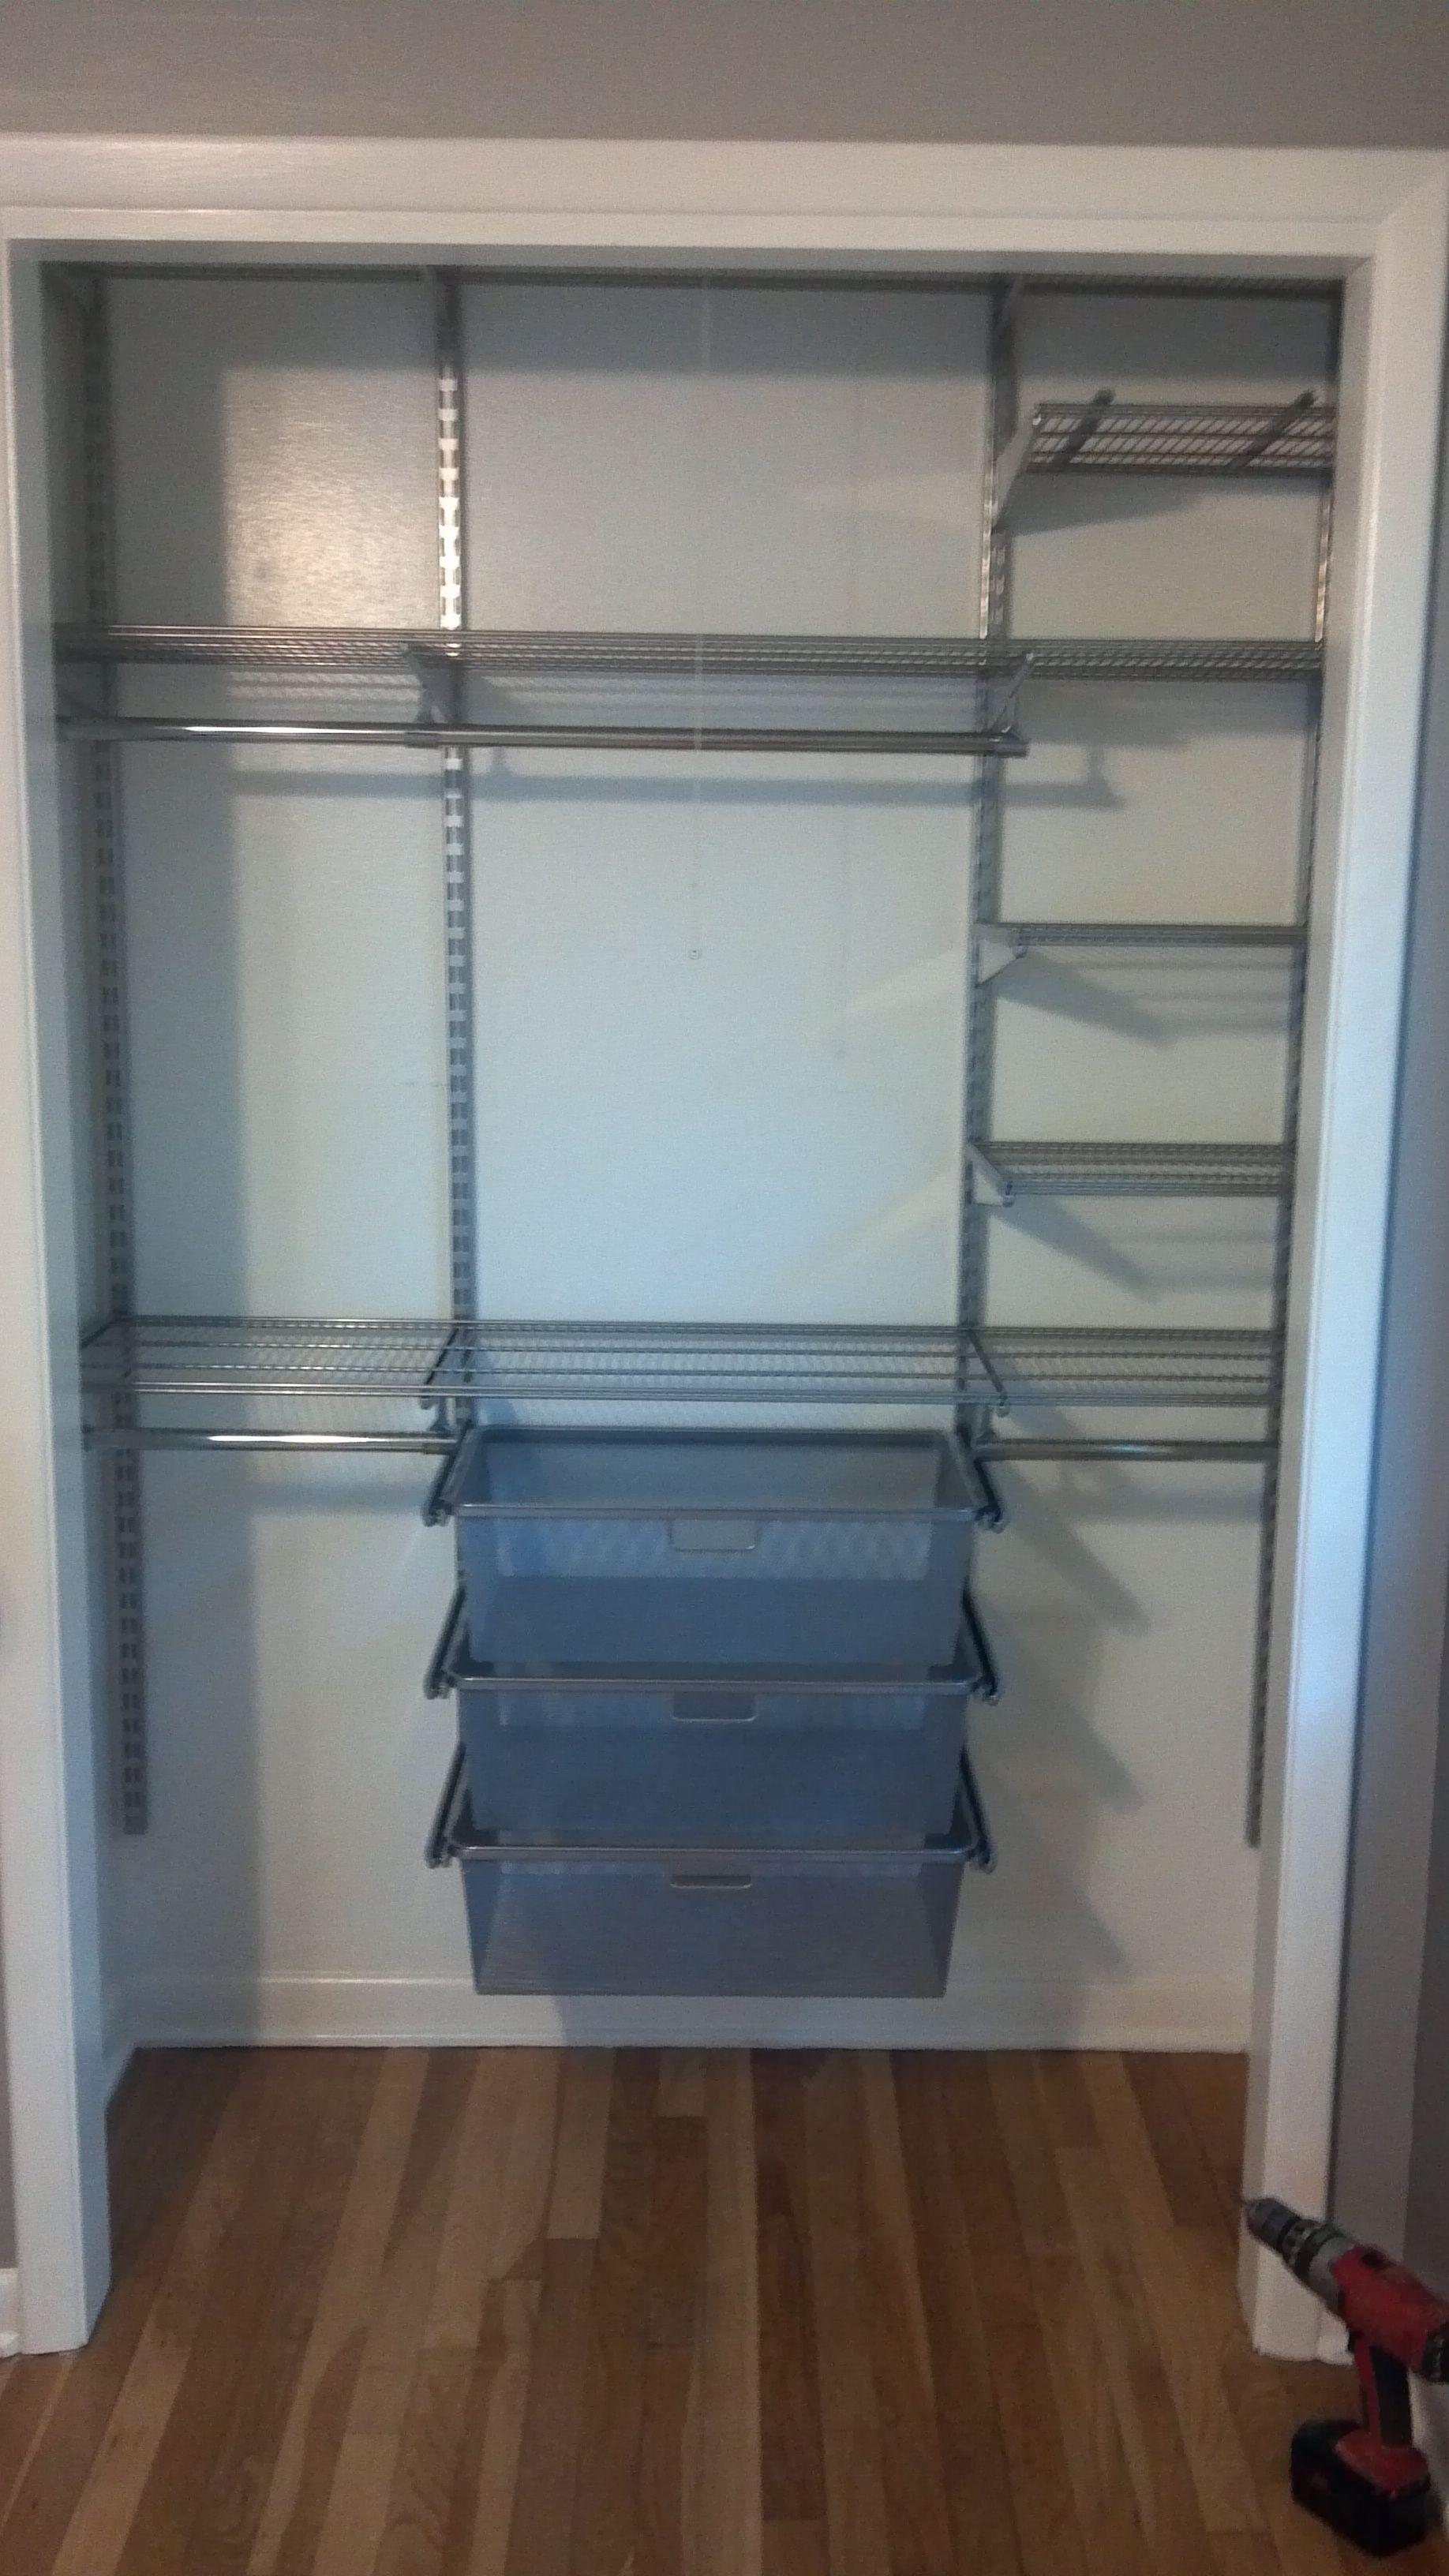 The Best Closet System Ever! Thanks Elfa : )